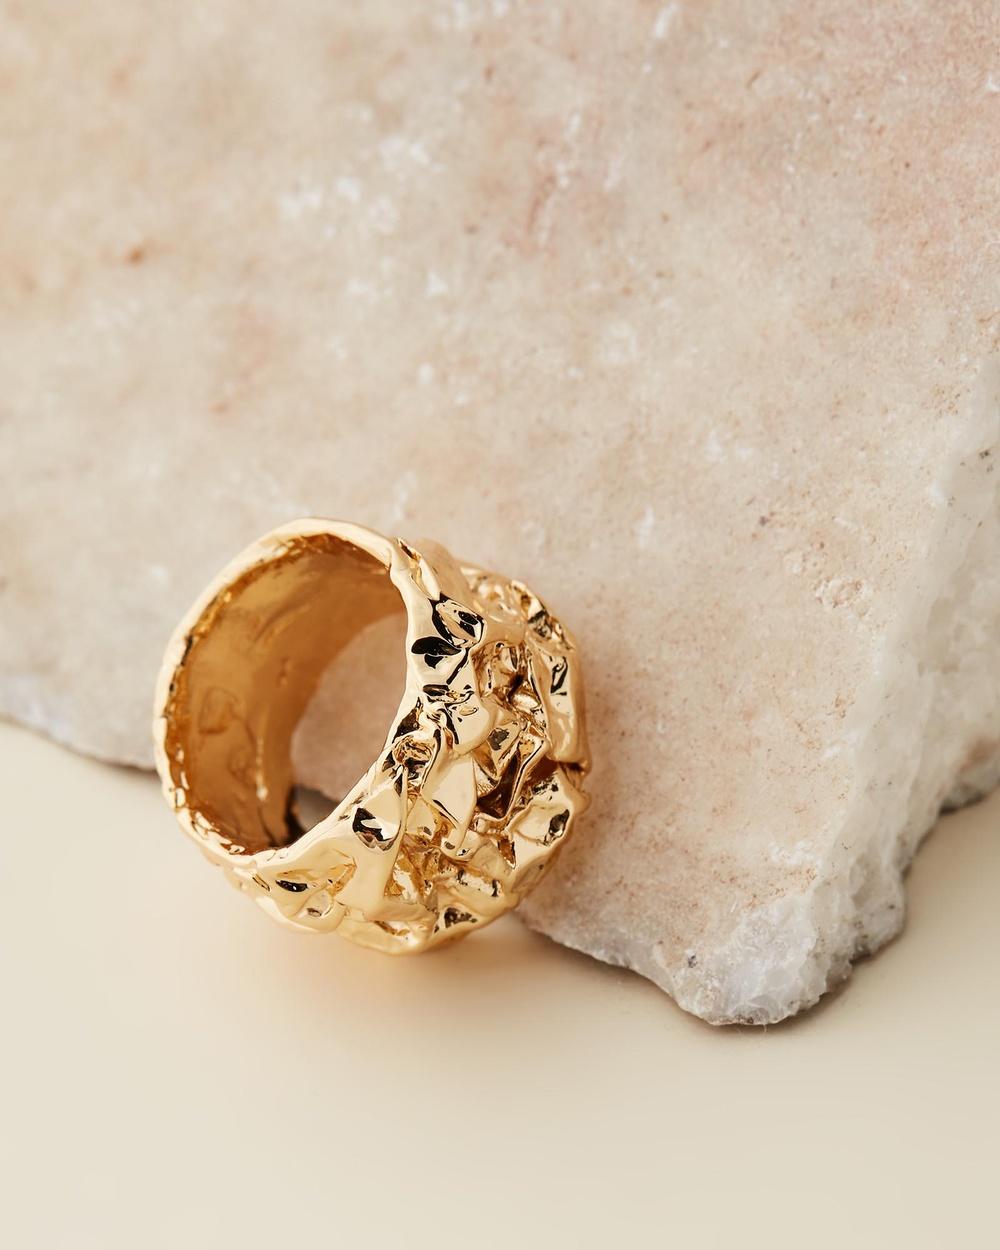 Amber Sceats Jadé Tunchy x Capri Ring Jewellery Gold